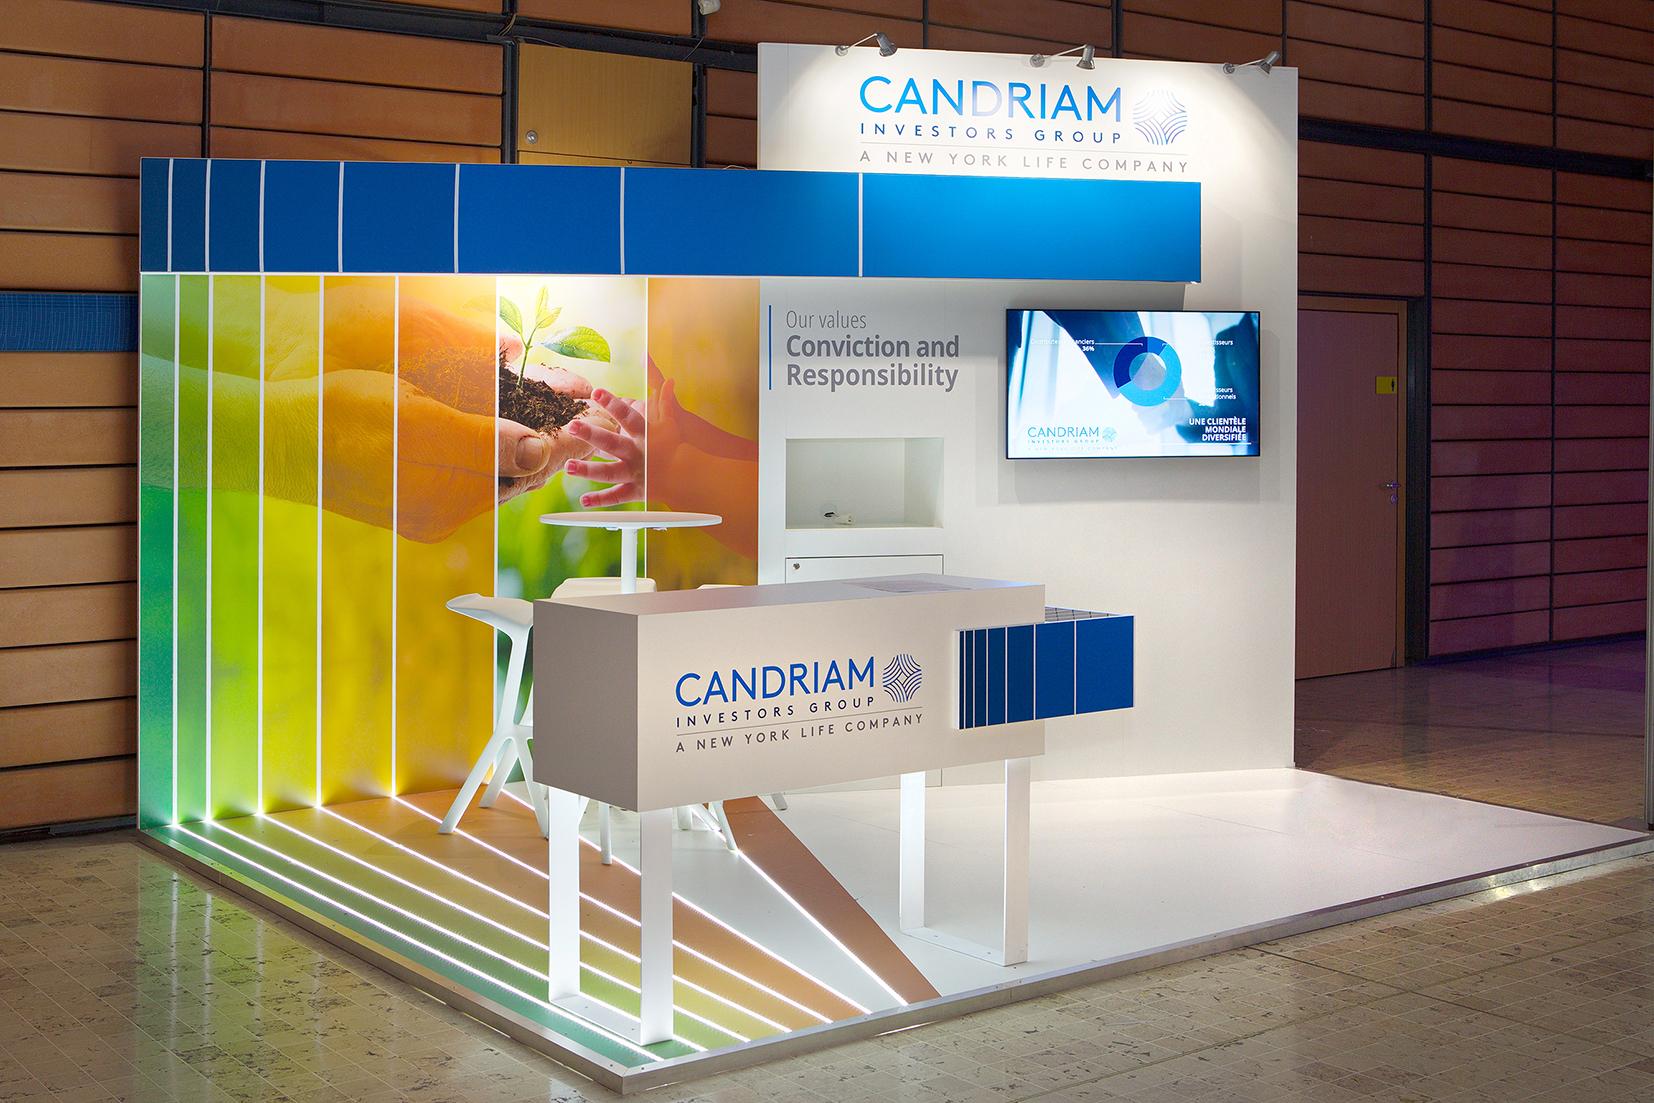 CANDRIAM lyon